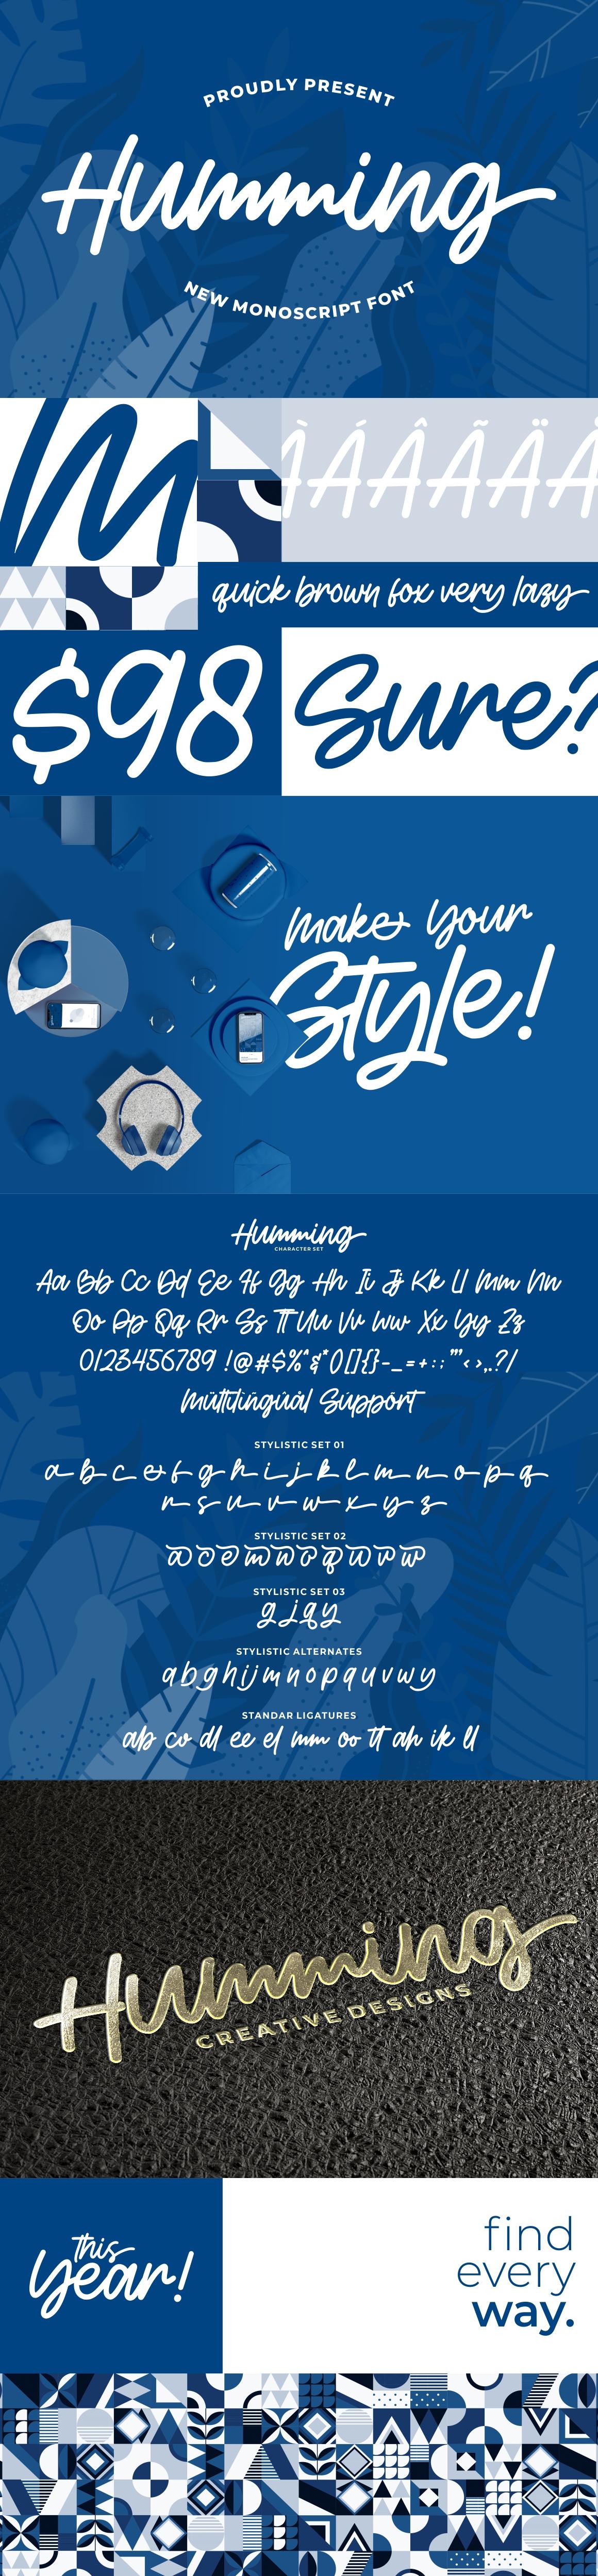 Humming - Monoscript Font example image 11